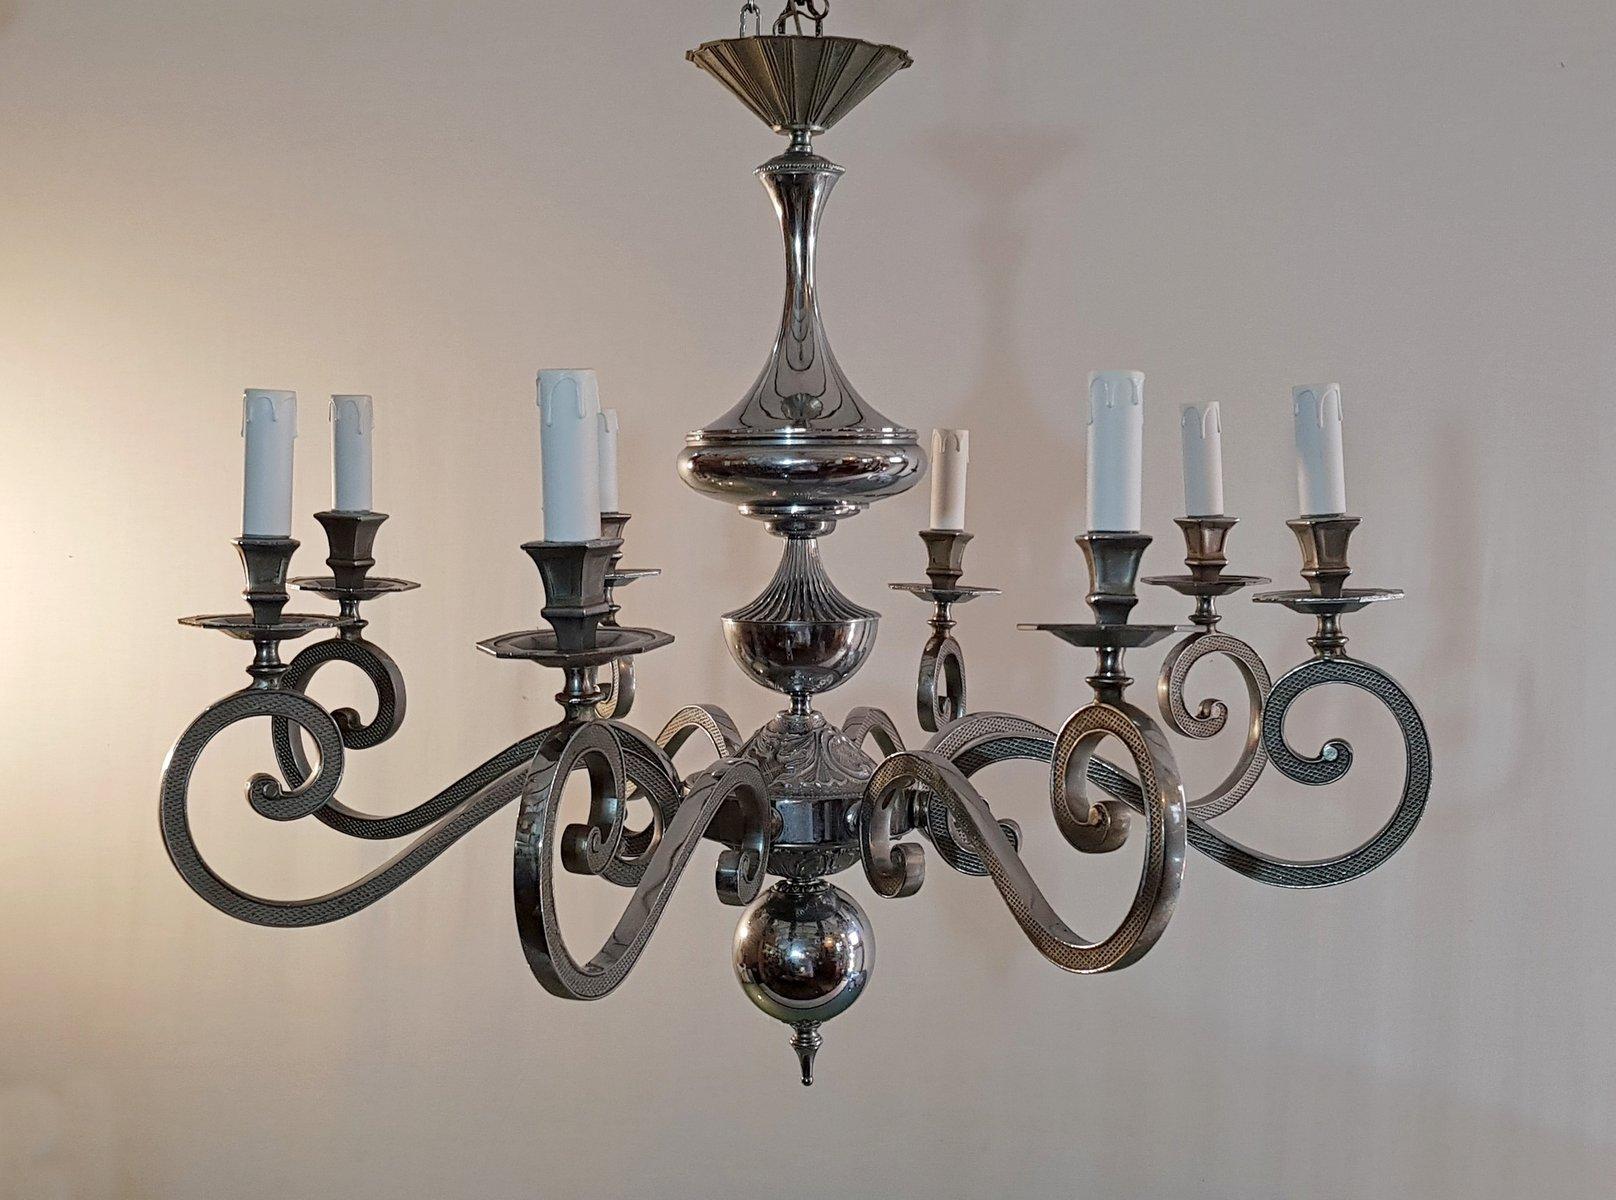 Lampadario barocco: wandlampe barocco a kollektion barocco by